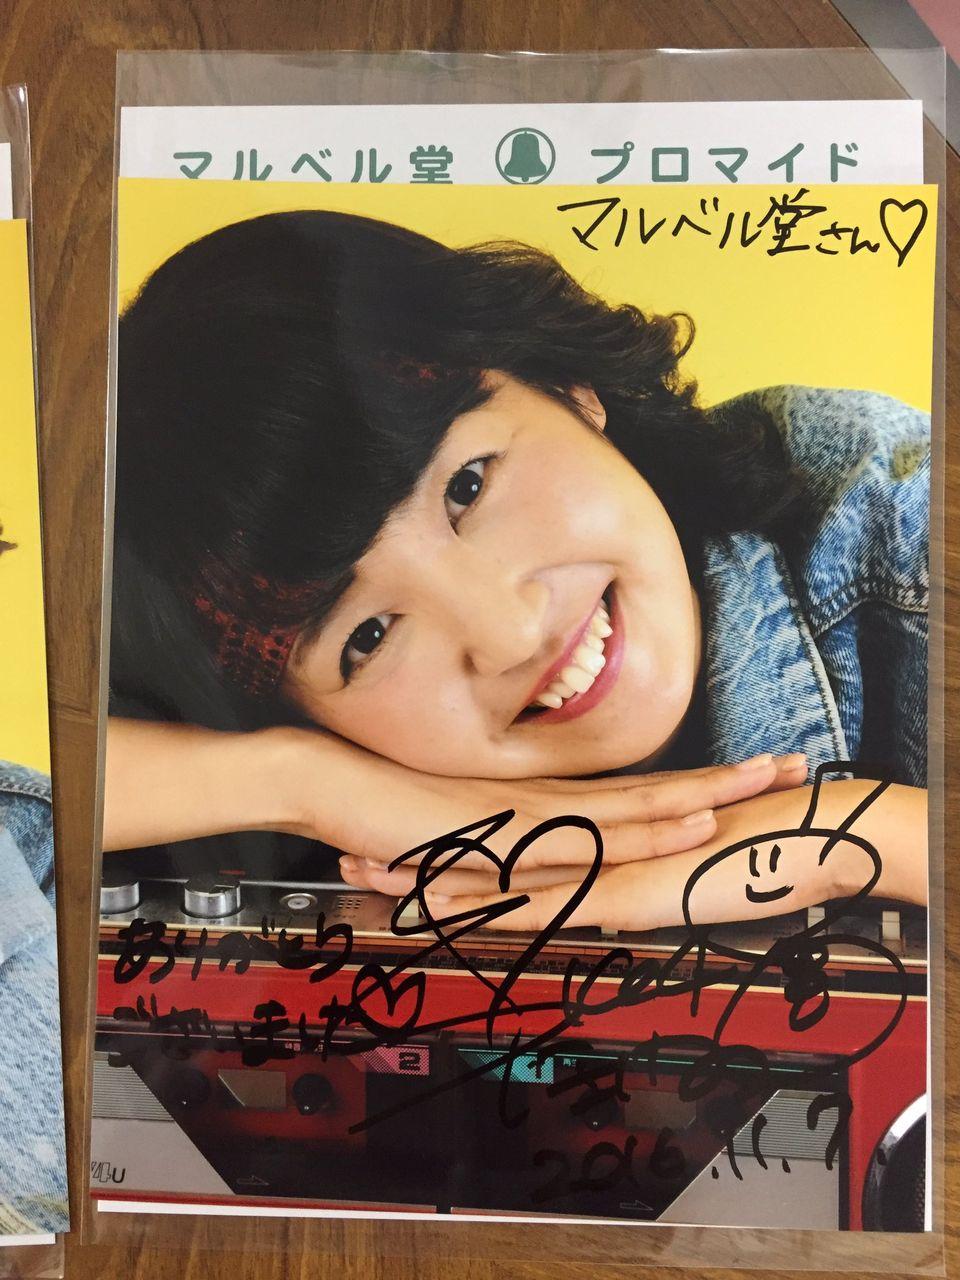 【SKE48】惣田紗莉渚が完全に昭和アイドルw w w w w w